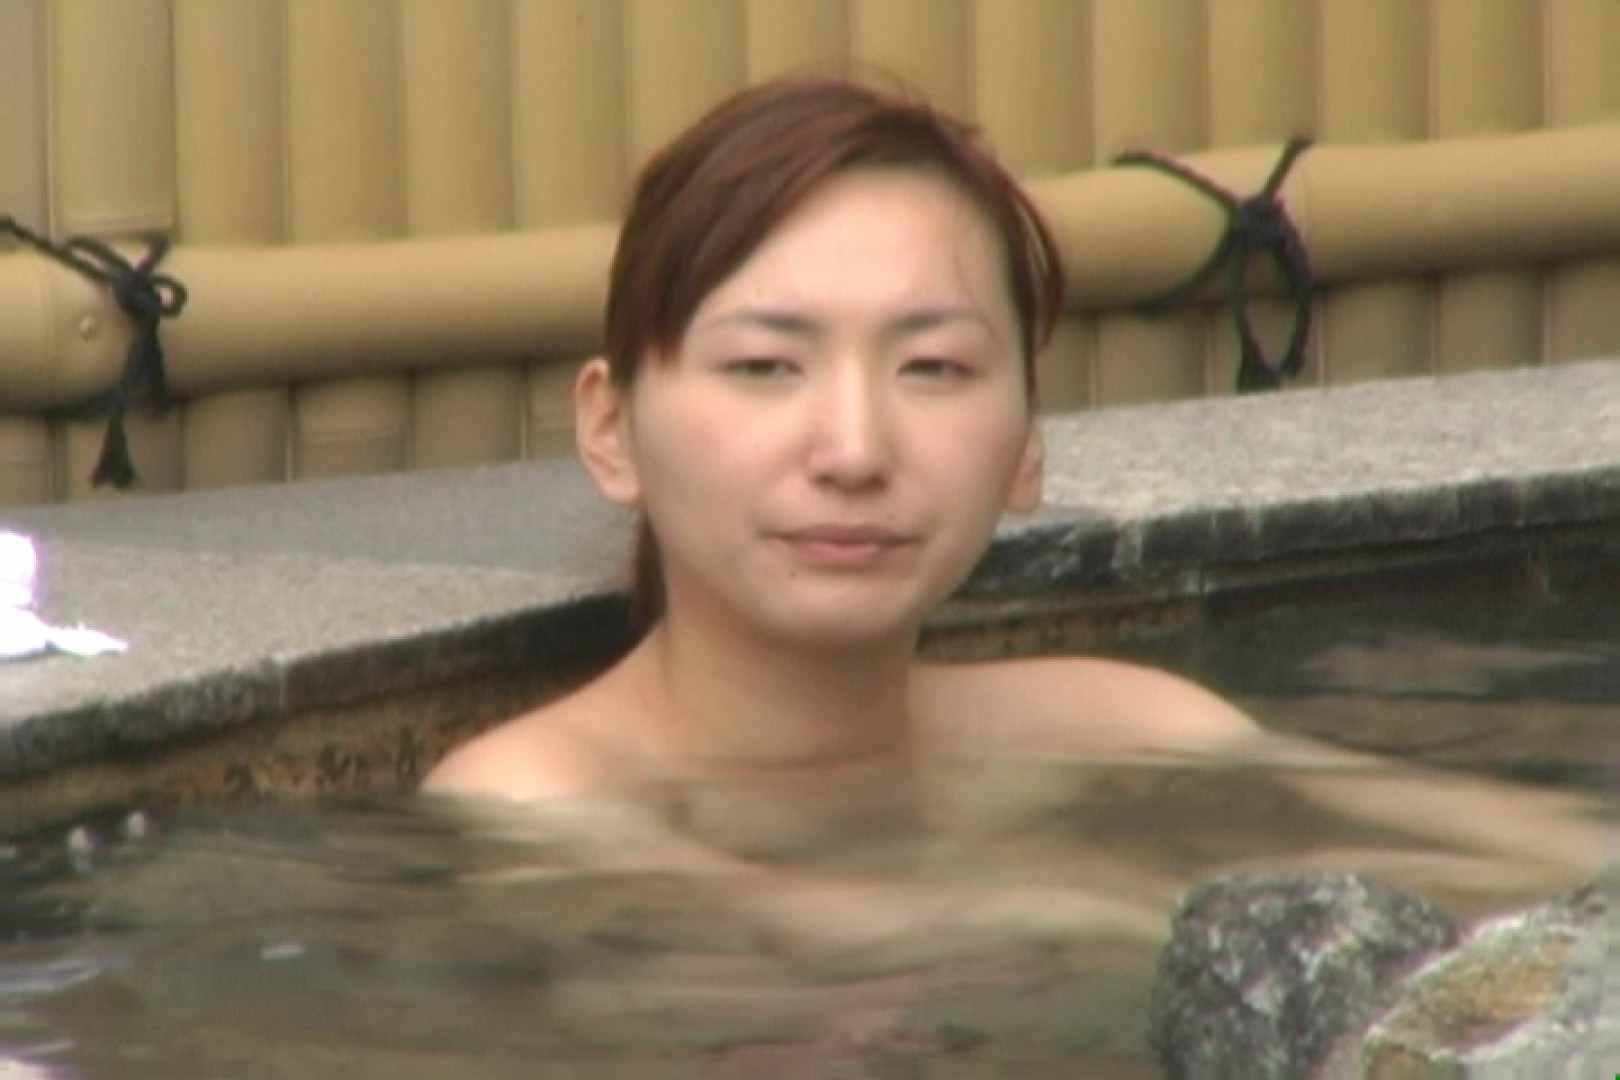 Aquaな露天風呂Vol.616 露天風呂編  89PIX 72